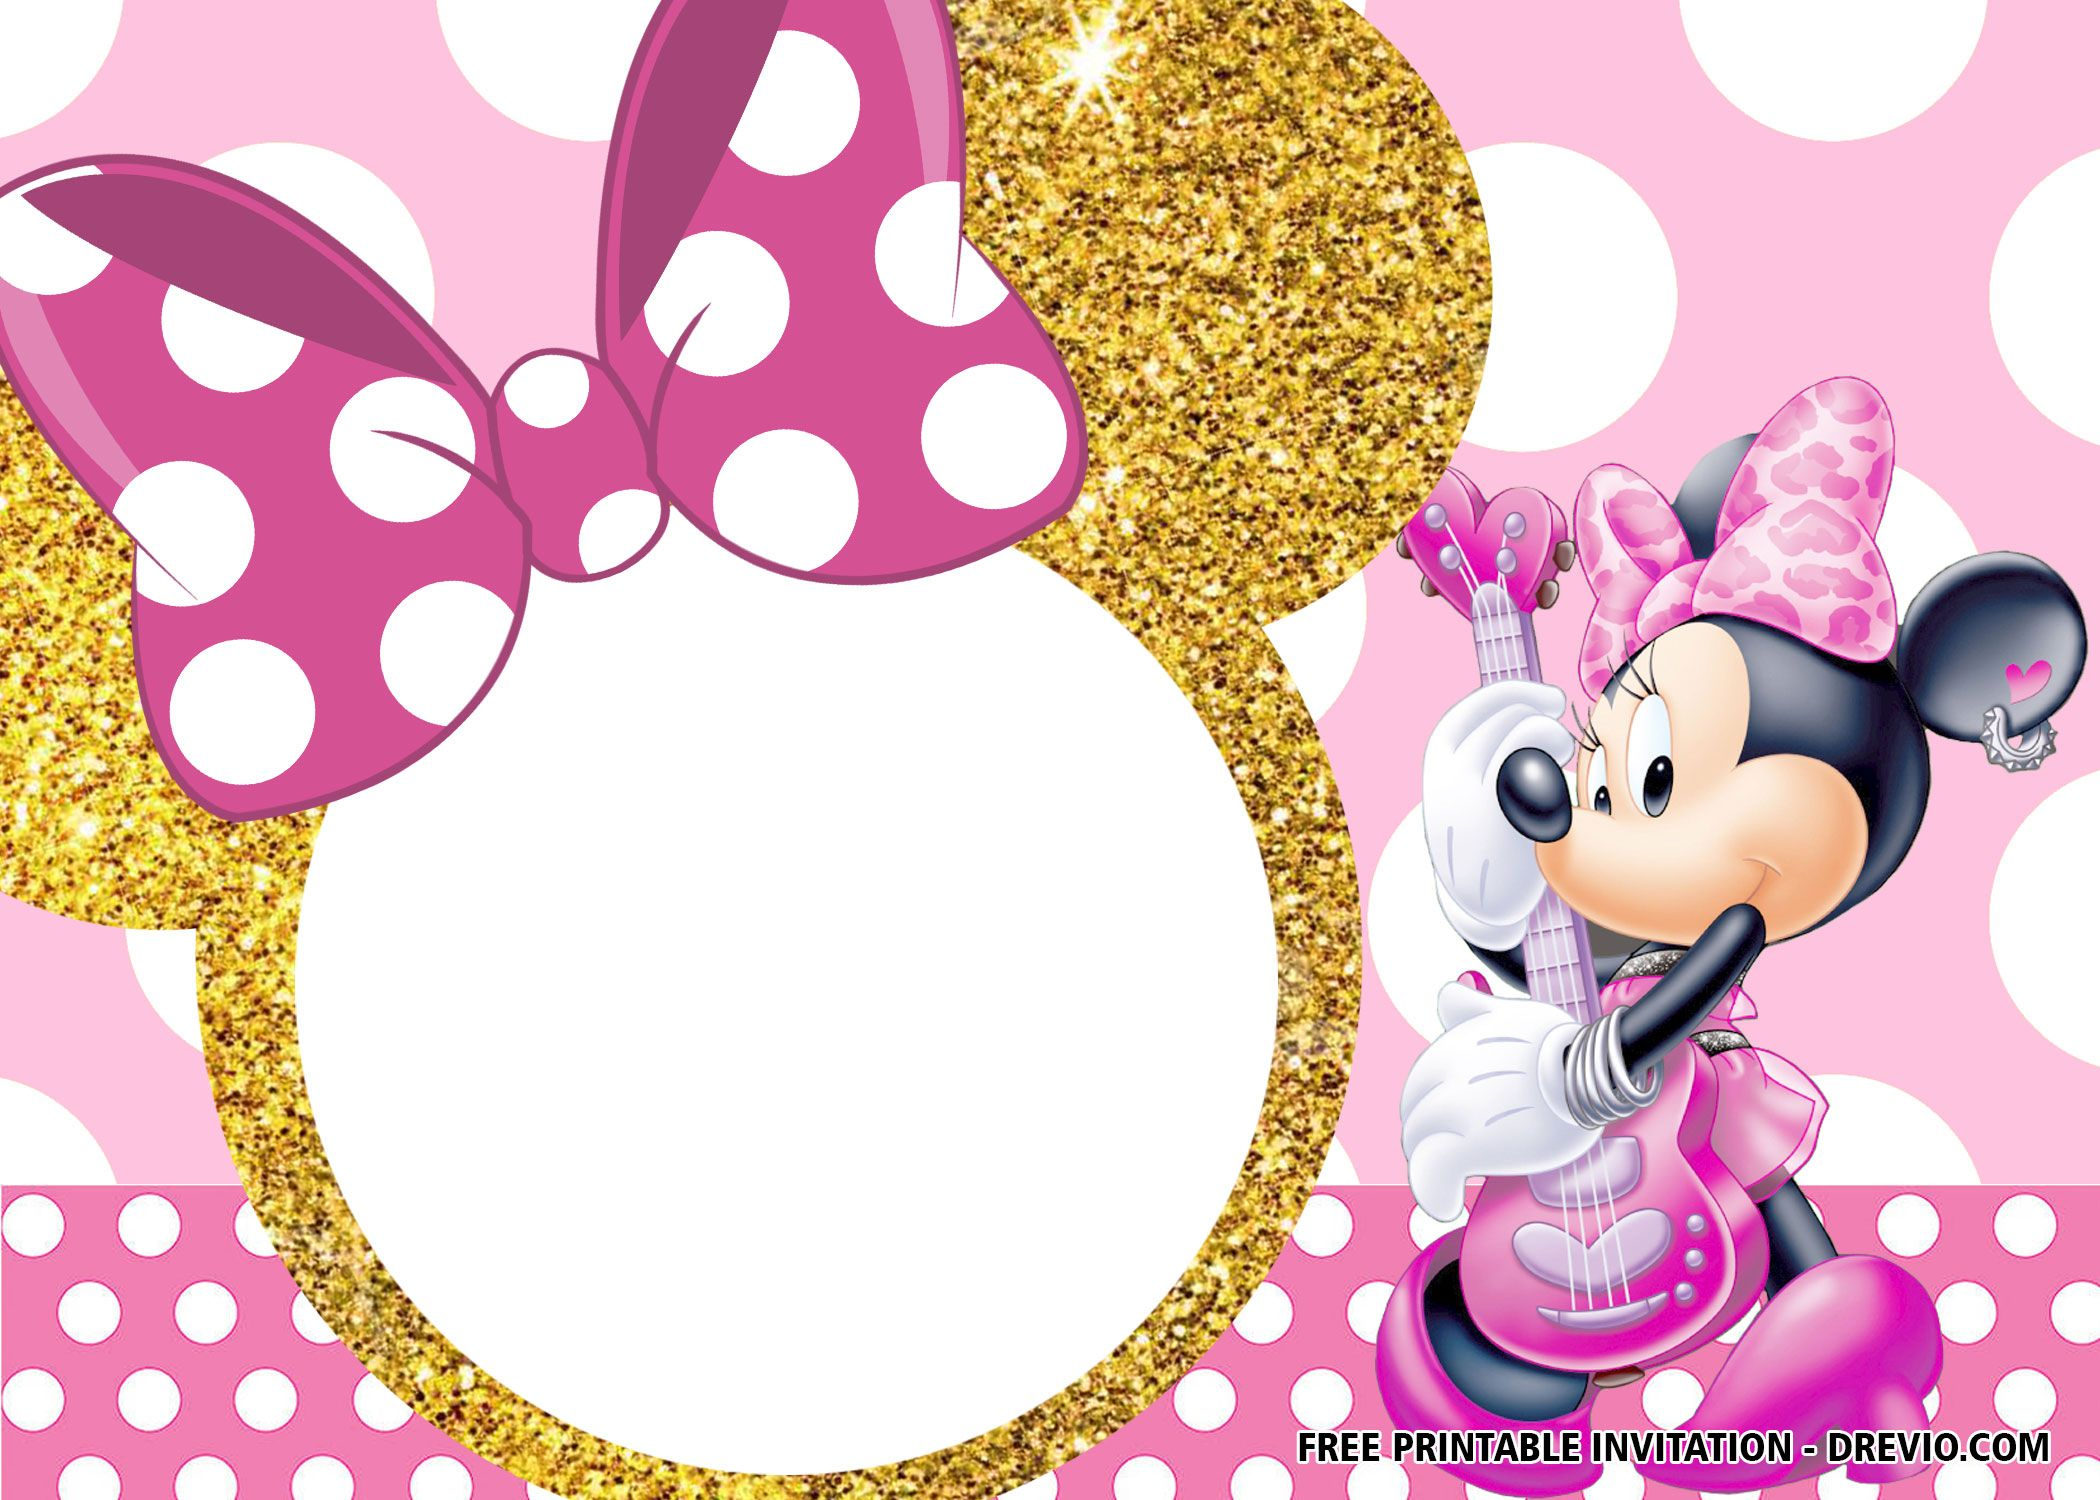 Blank Printable Mickey Mouse 1st Birthday Invitation Mickey Mouse Birthday Invitations Mickey Mouse Invitation Mickey Mouse 1st Birthday